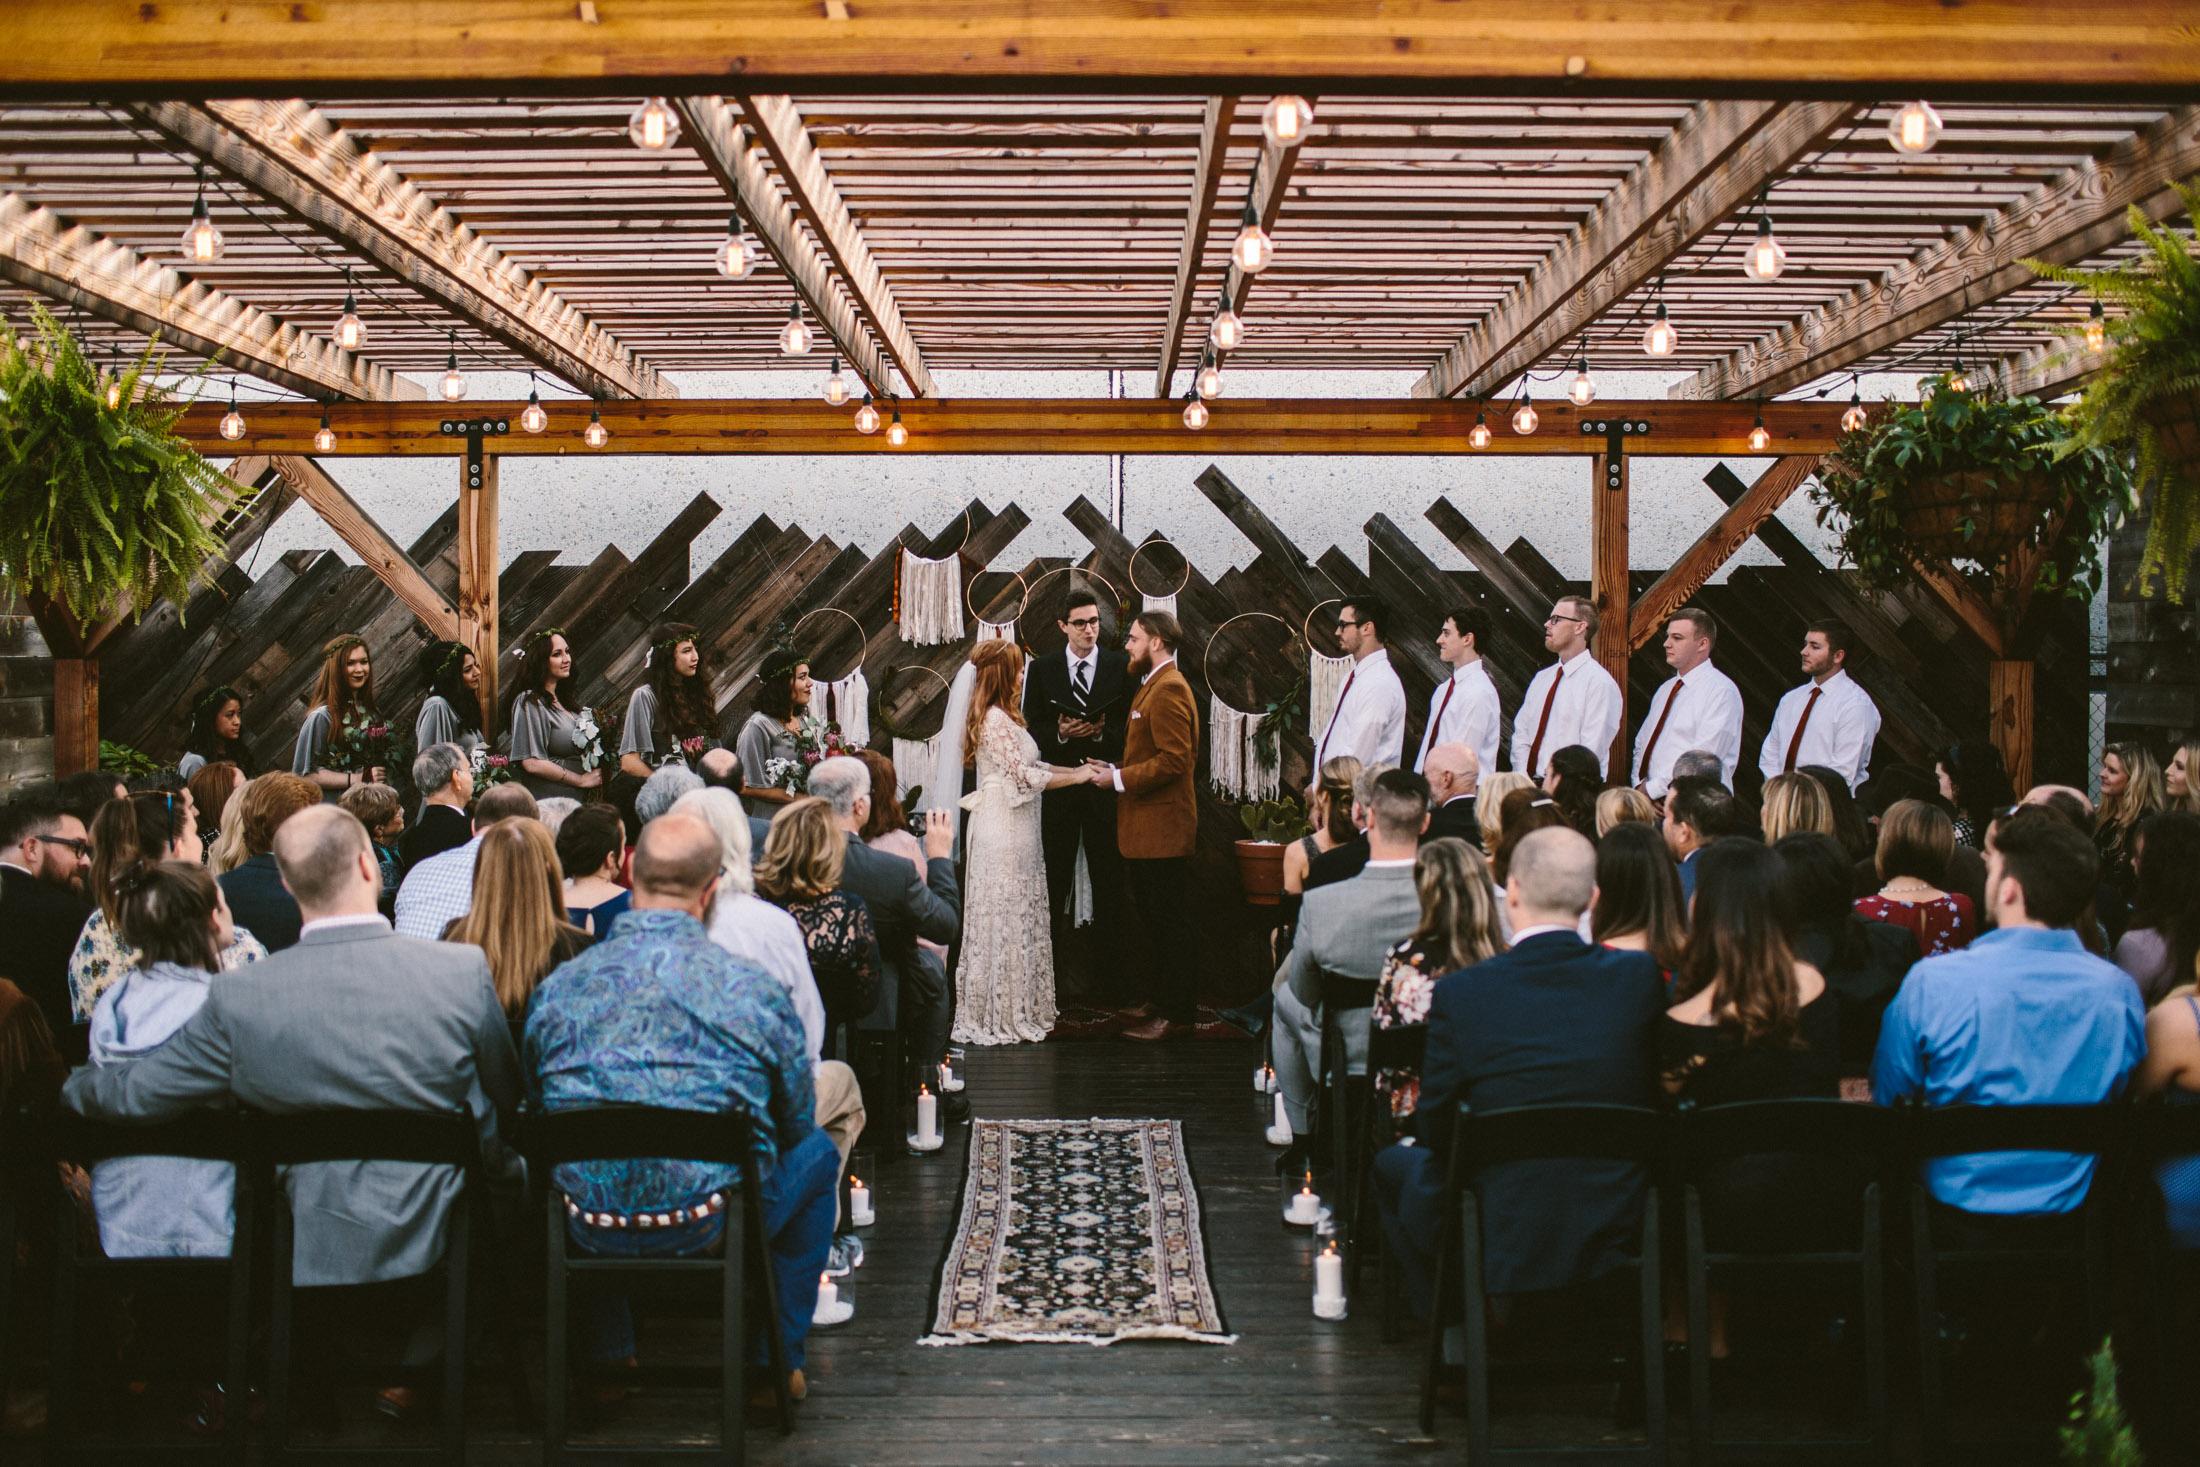 The-woodshed-booze-brothers-venue-wedding-74.jpg